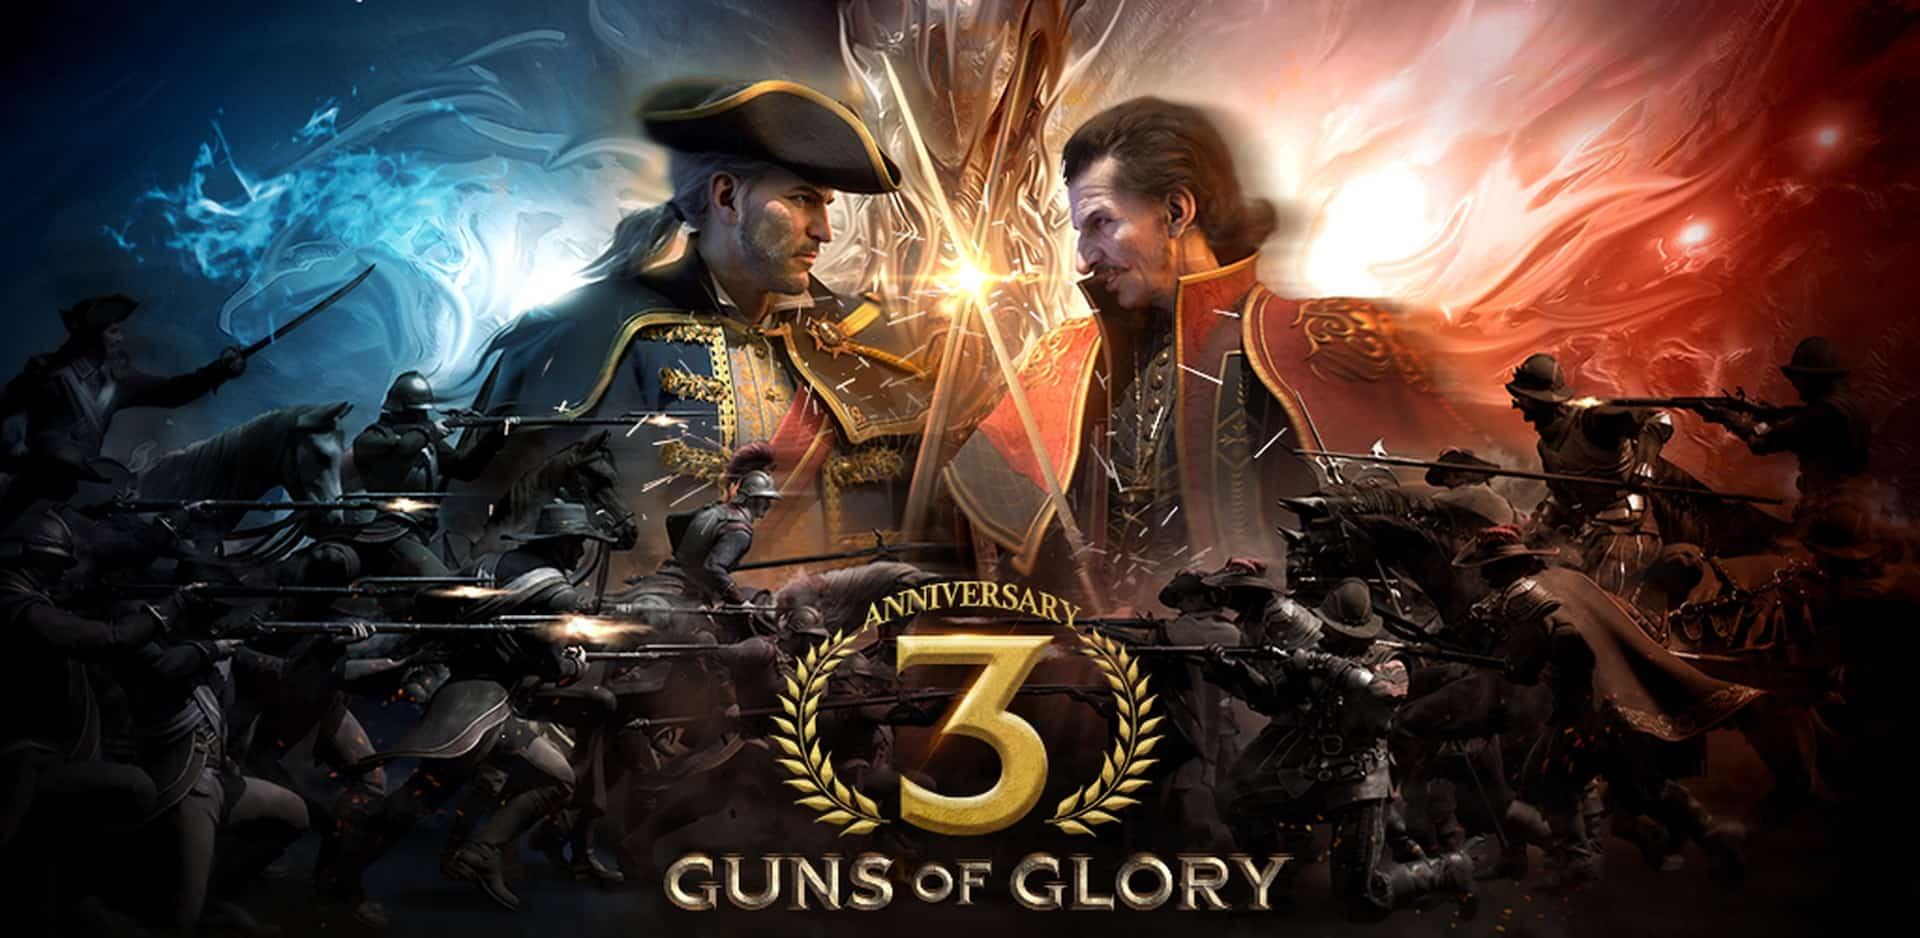 Guns of Glory 7